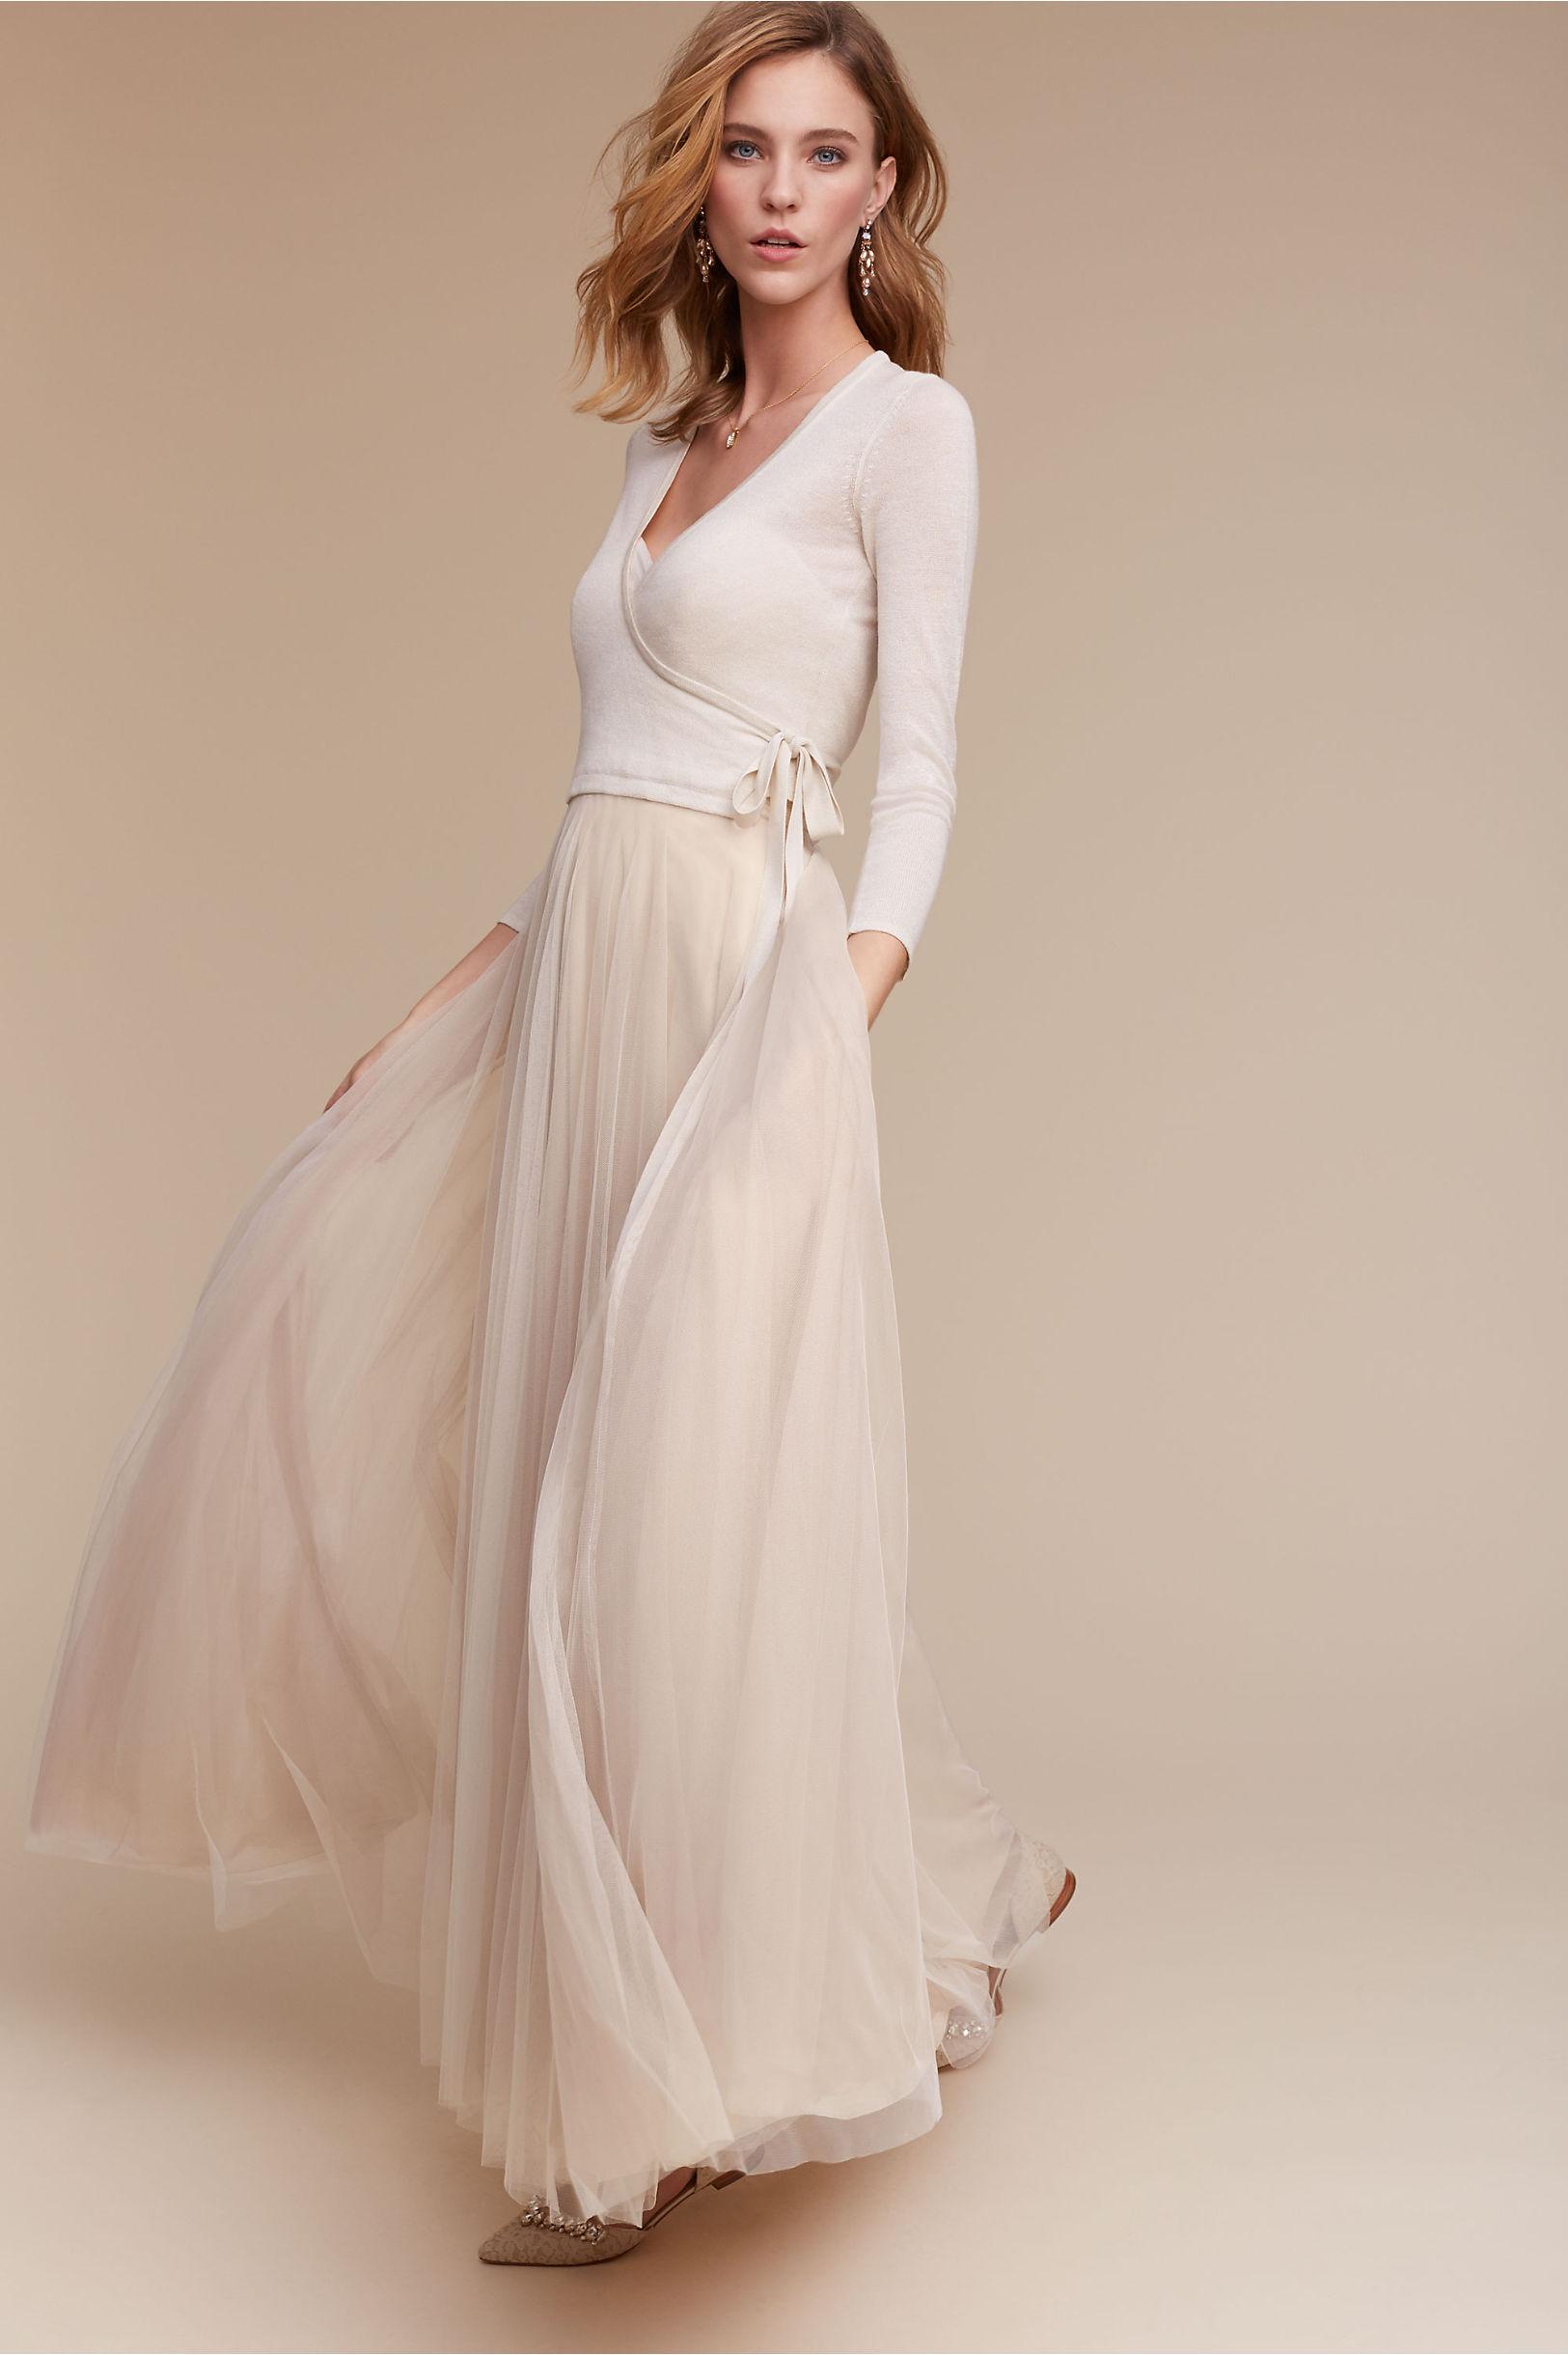 Cashmere Wrap Bridal Cardi